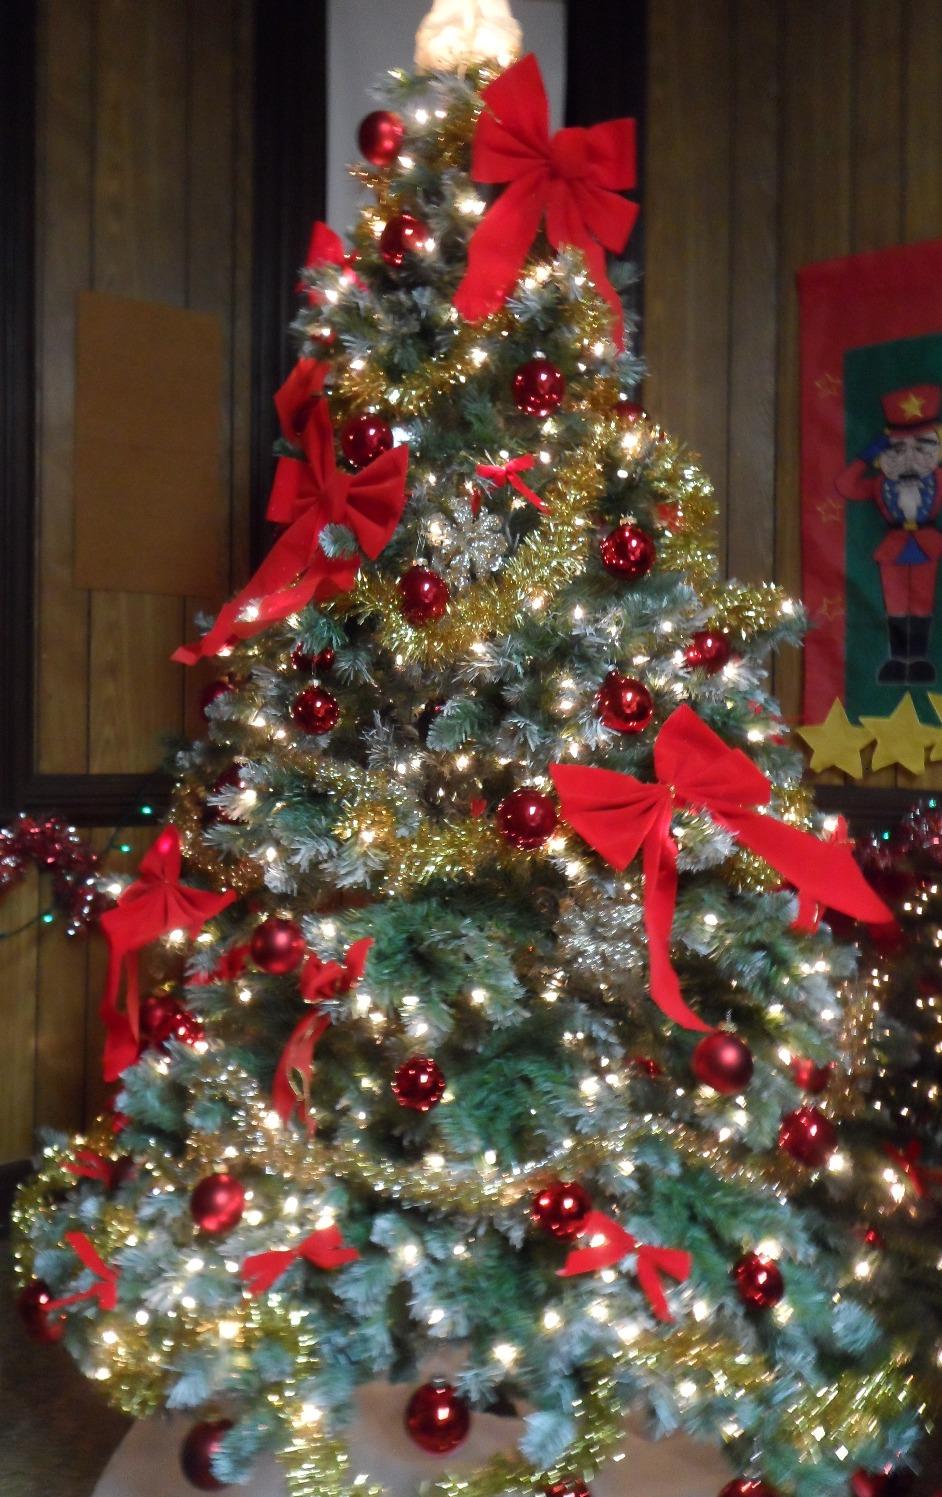 Gift Shop - revolving tree